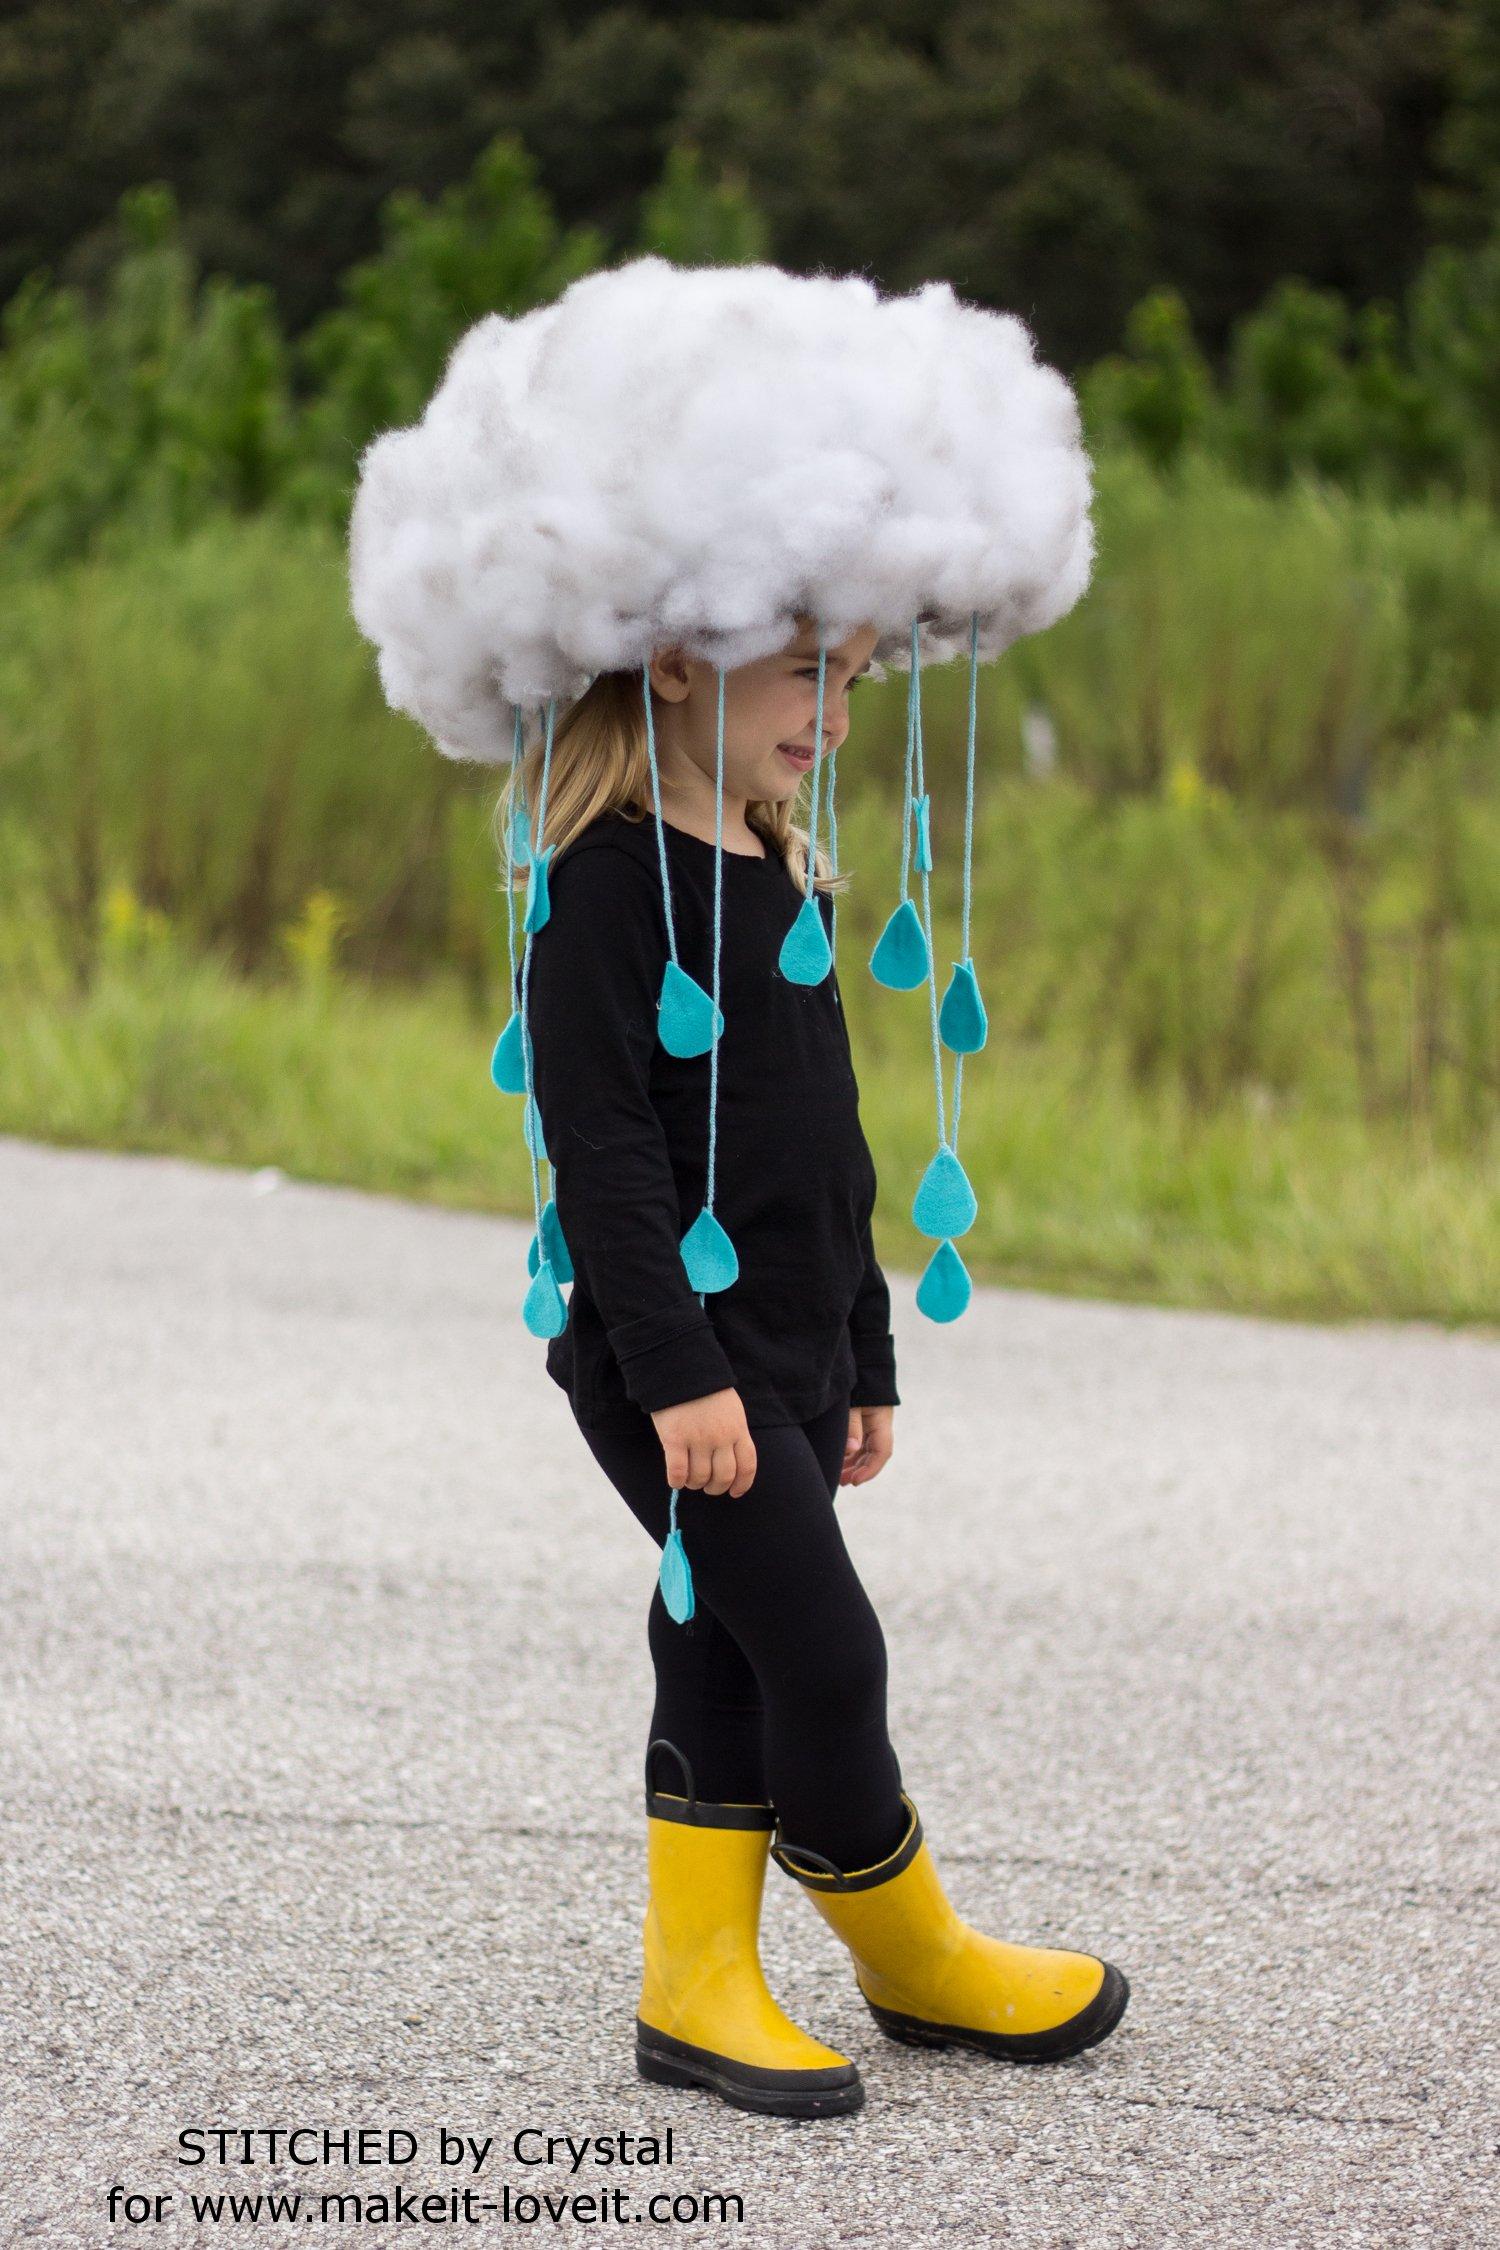 Make a quick & easy RAIN CLOUD COSTUME...for all ages! | via makeit-loveit.com